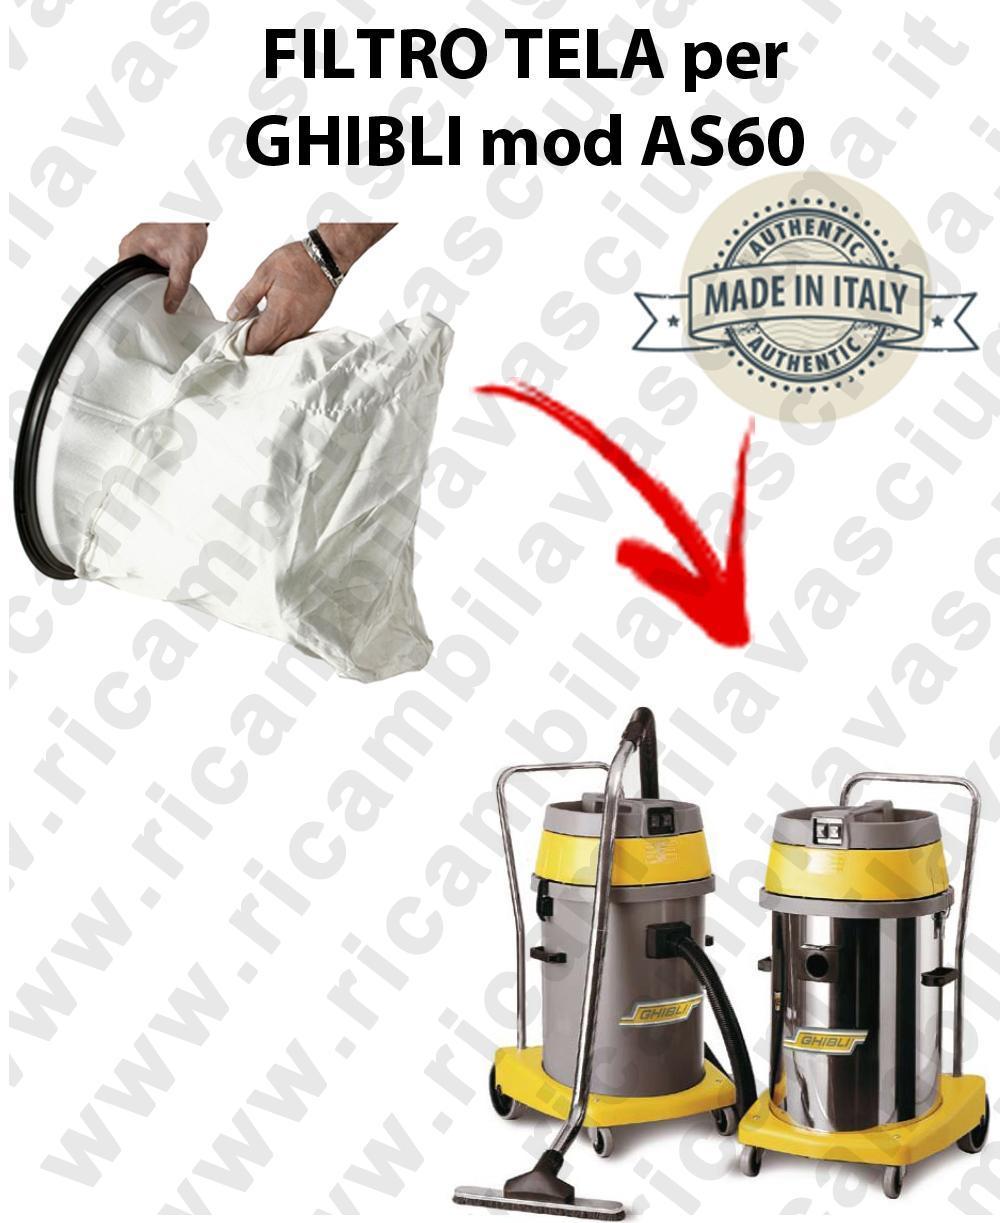 SACCO Filtro de Nylon cod: 3001220 para aspiradora GHIBLI Model AS60